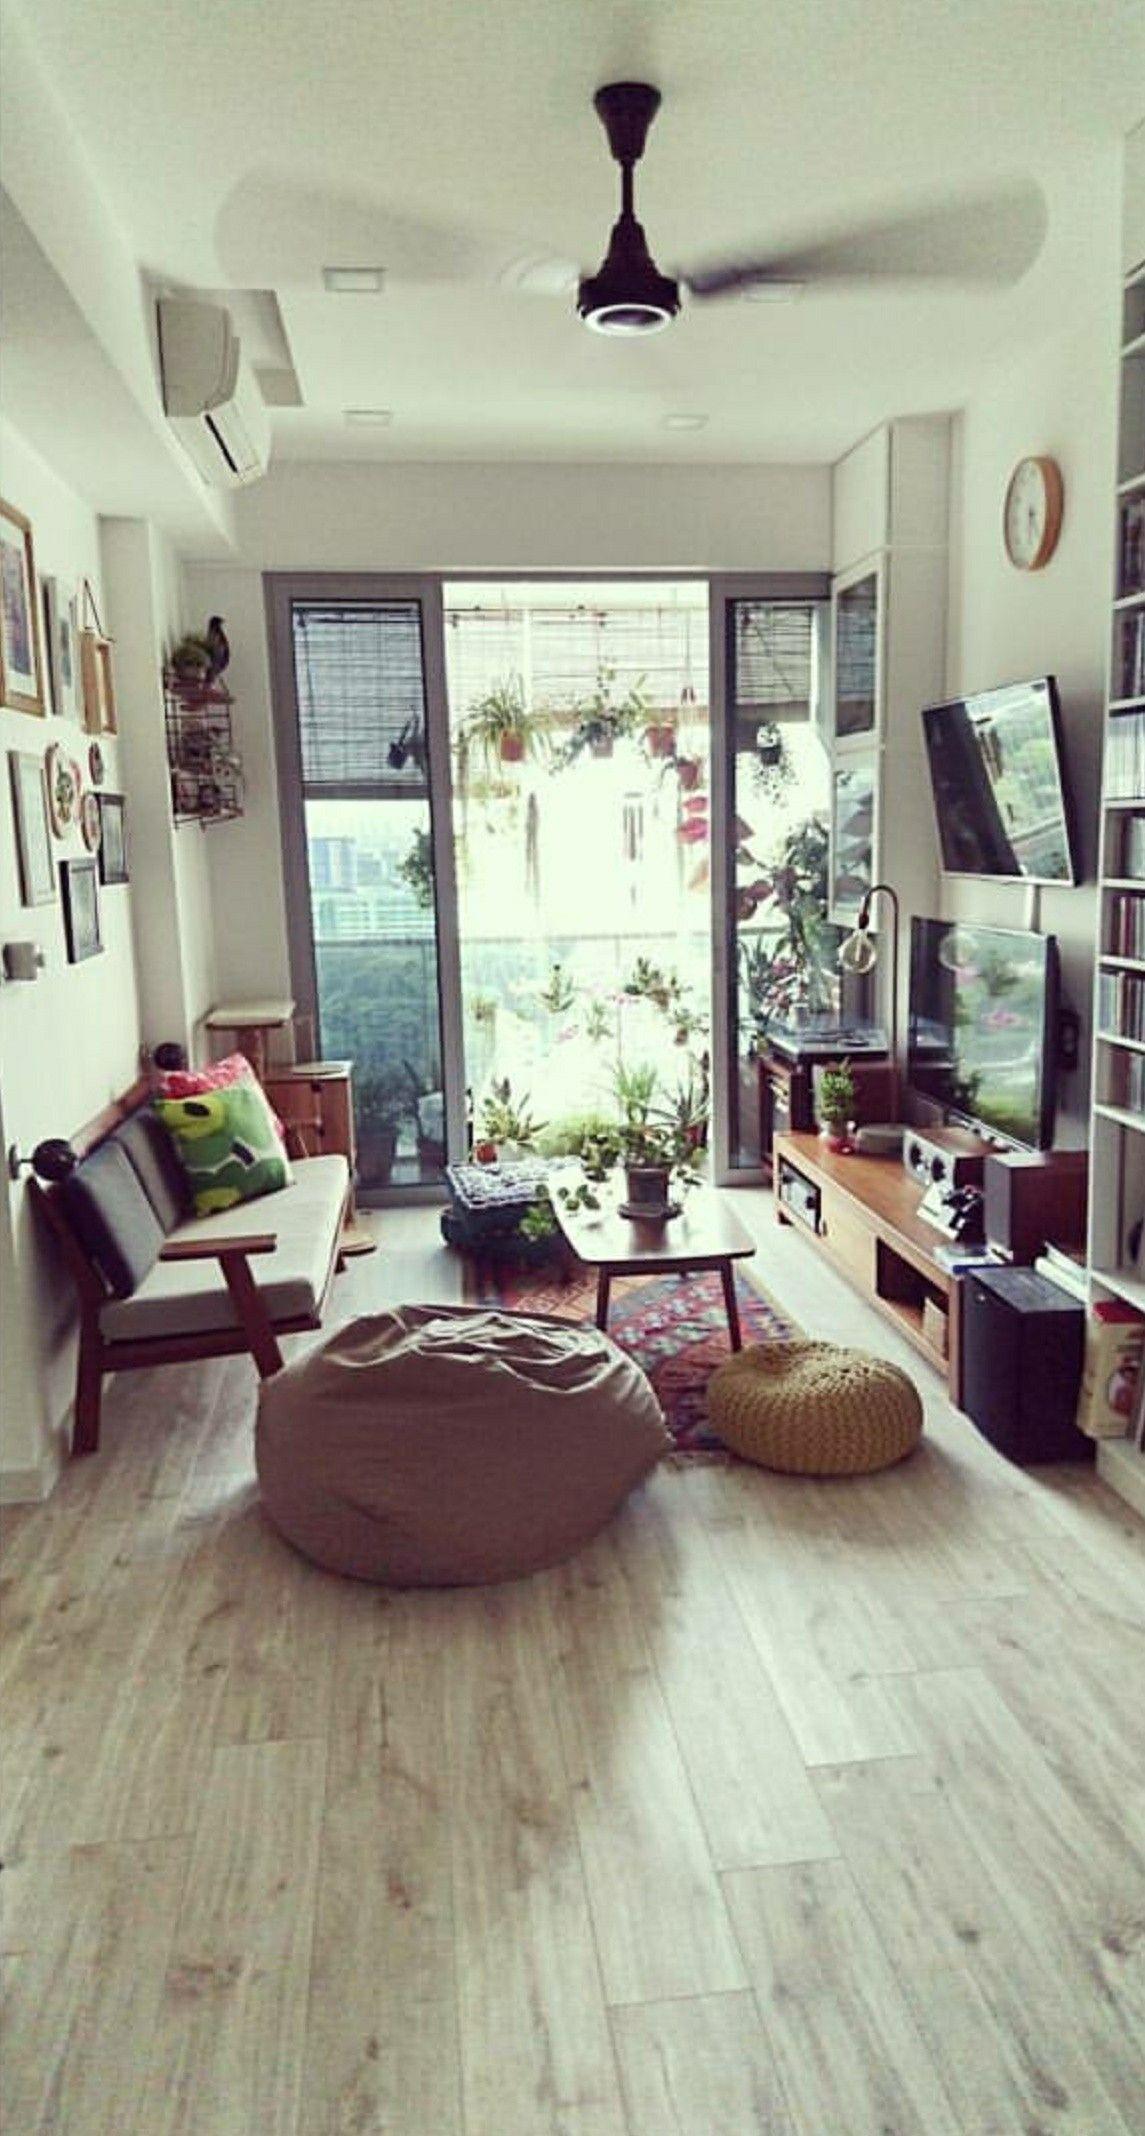 Small Apartment Living Muji Scanteak Rug Plants